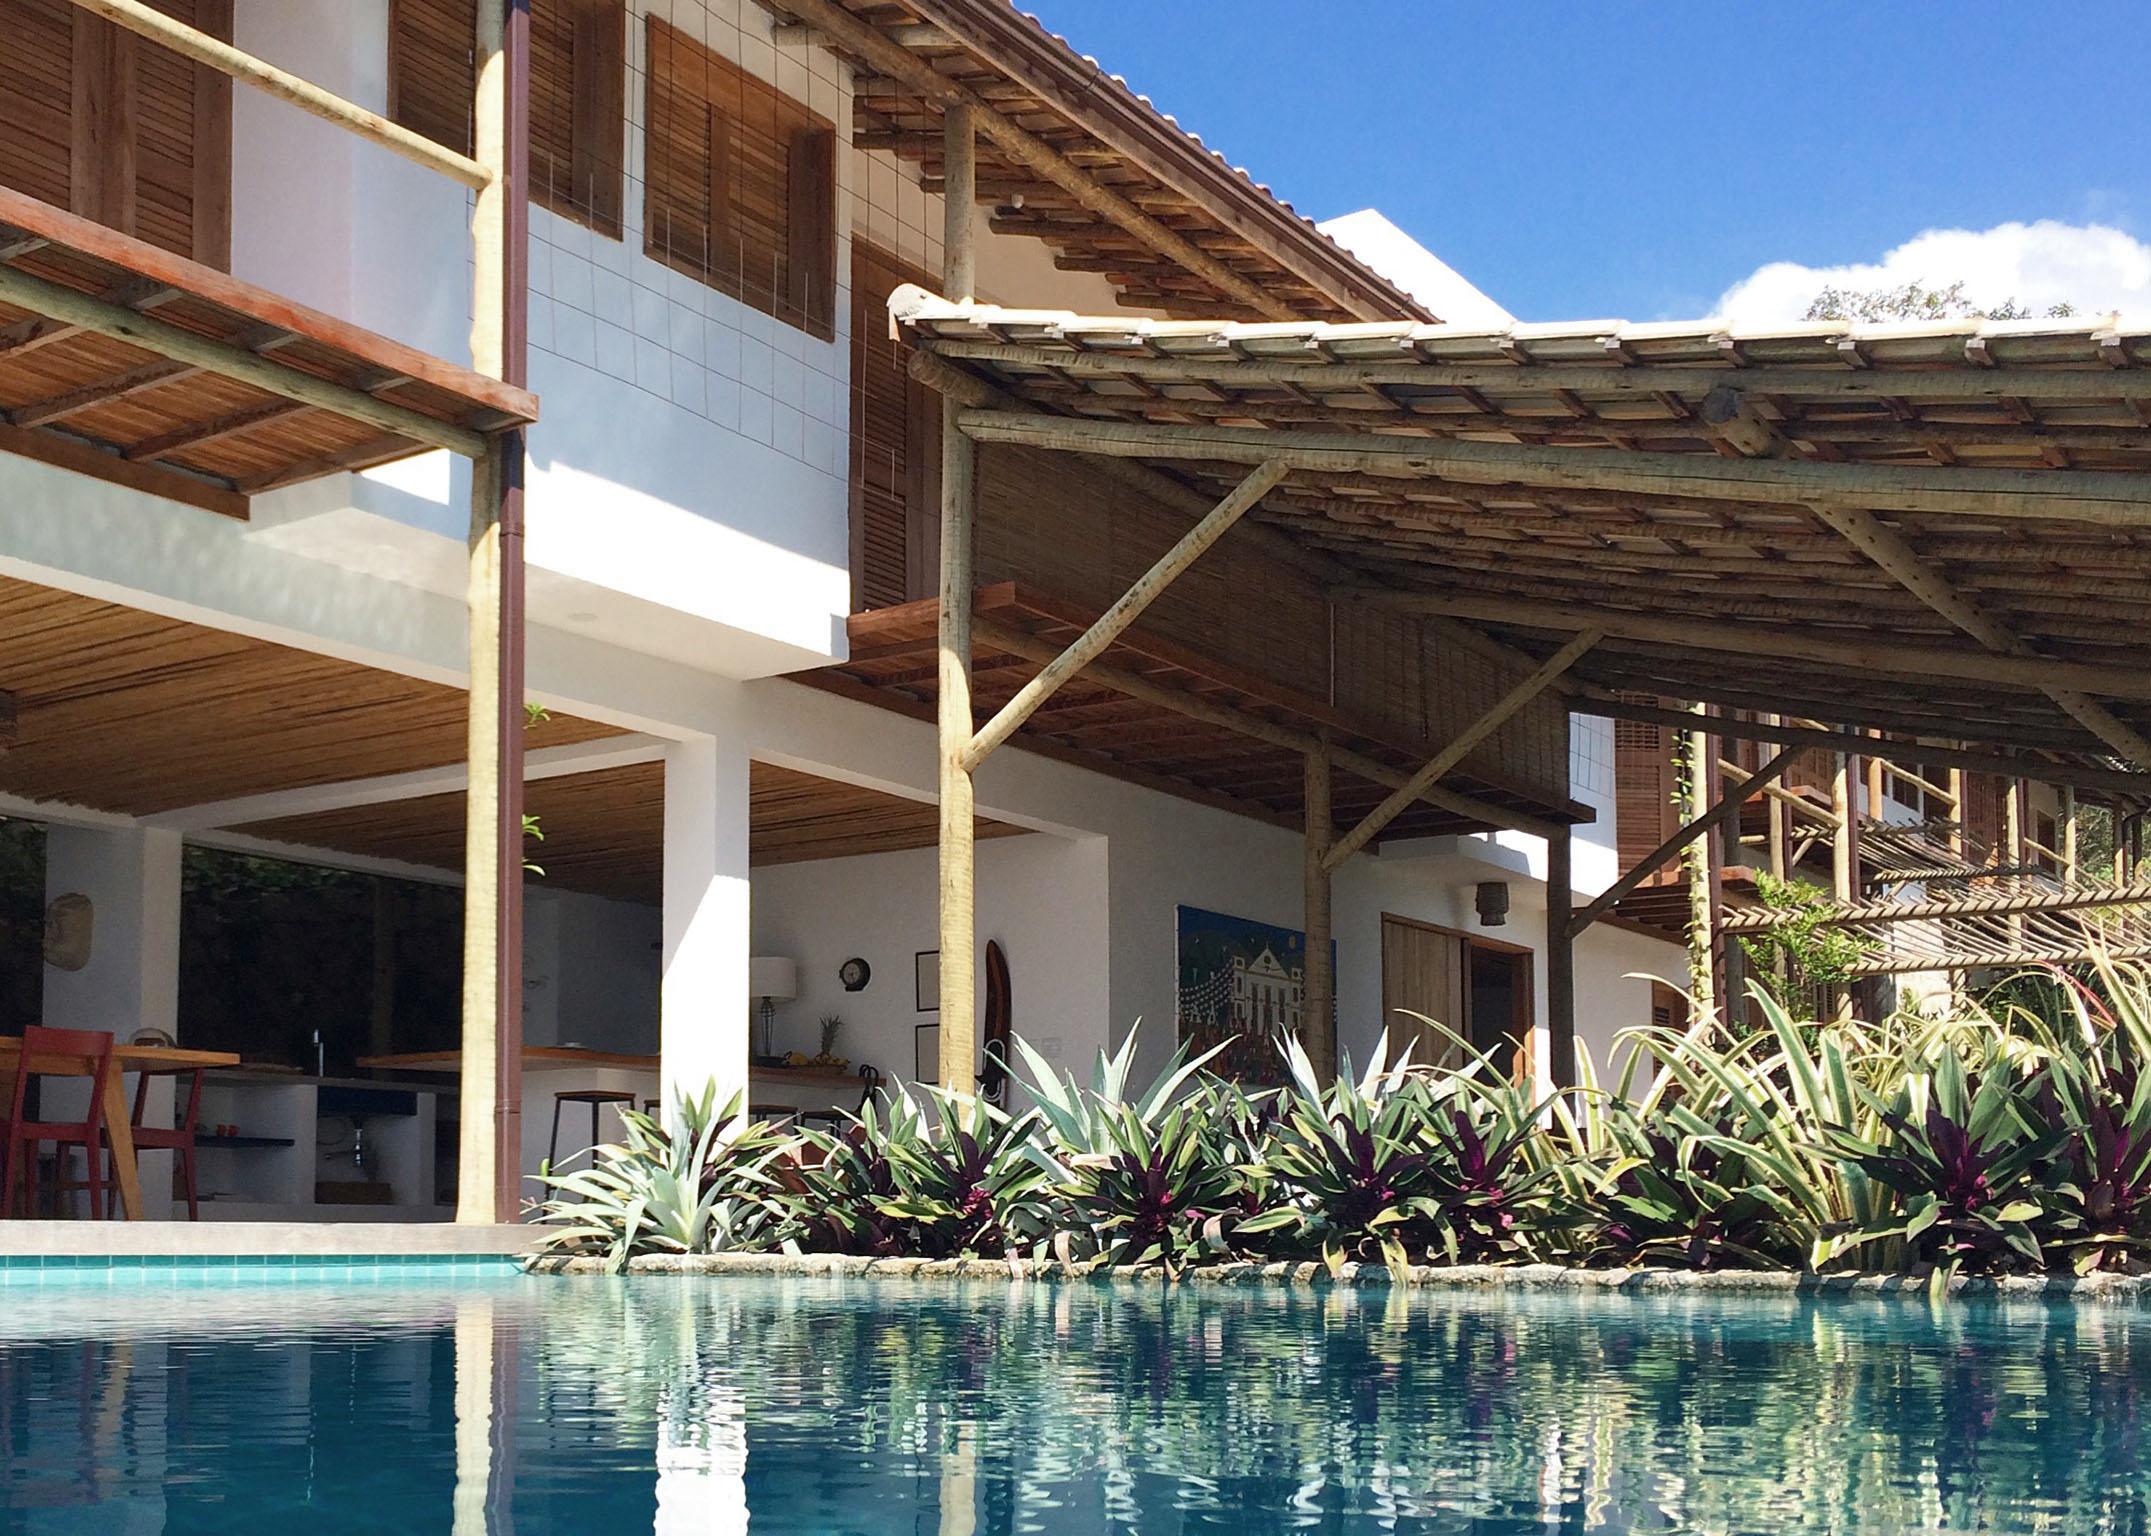 Boutique Hotel Paraty Brazil